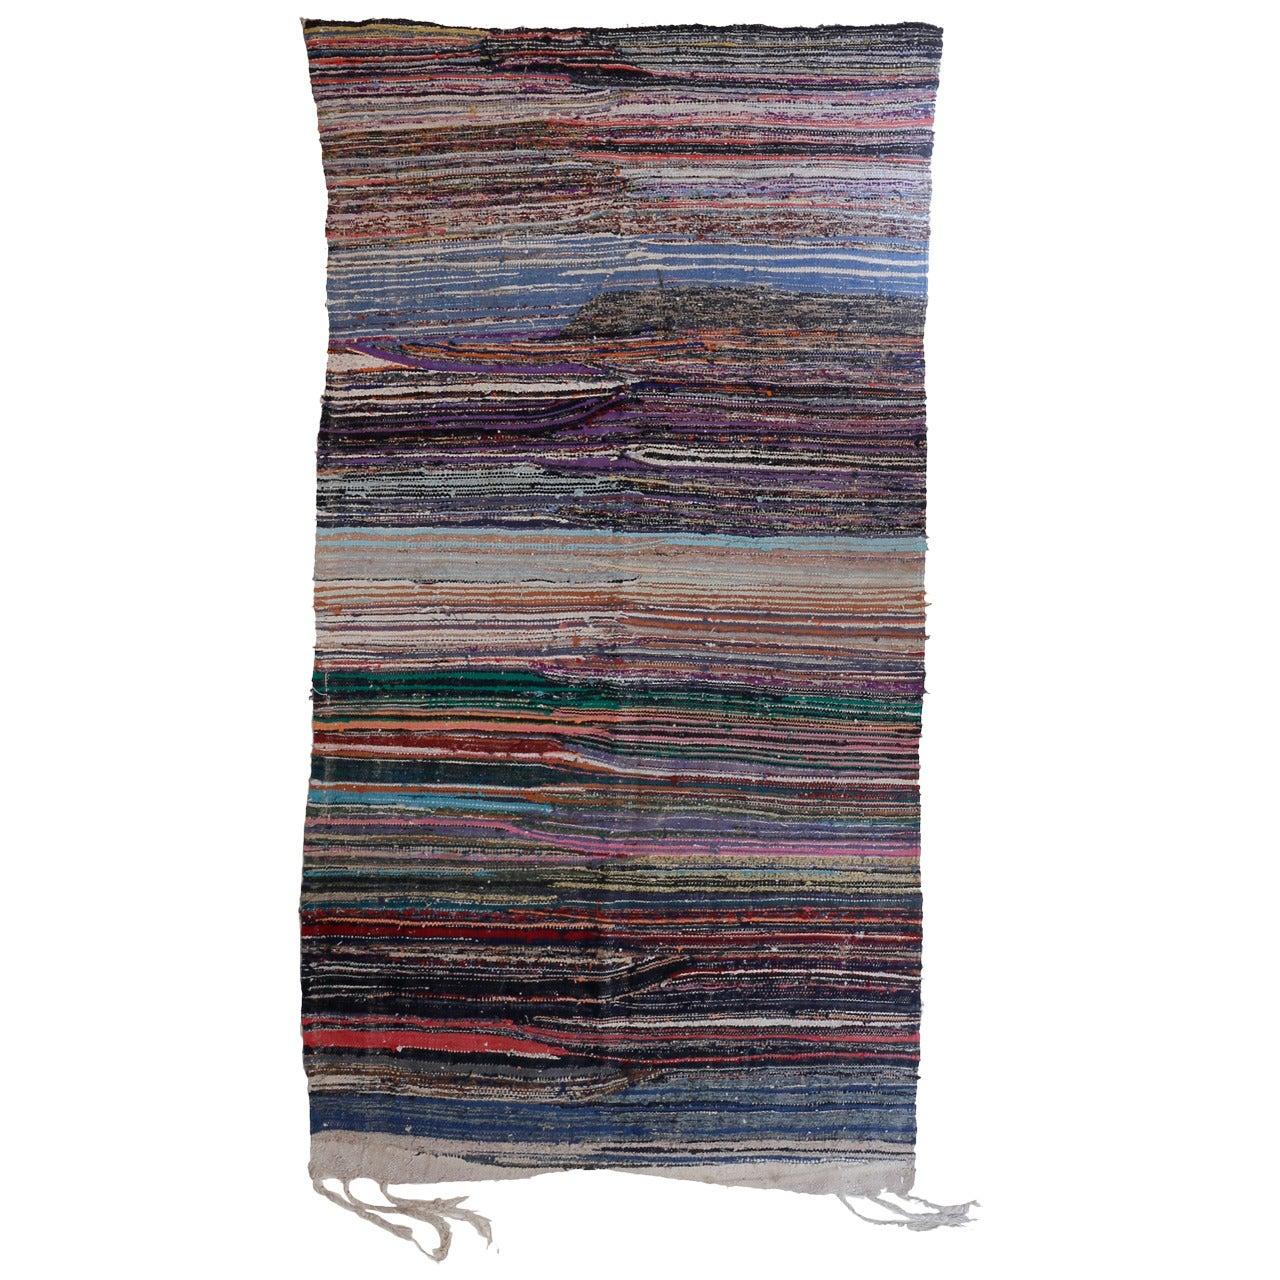 Vintage Moroccan Berber Boucherouite Flat-Weave Rug